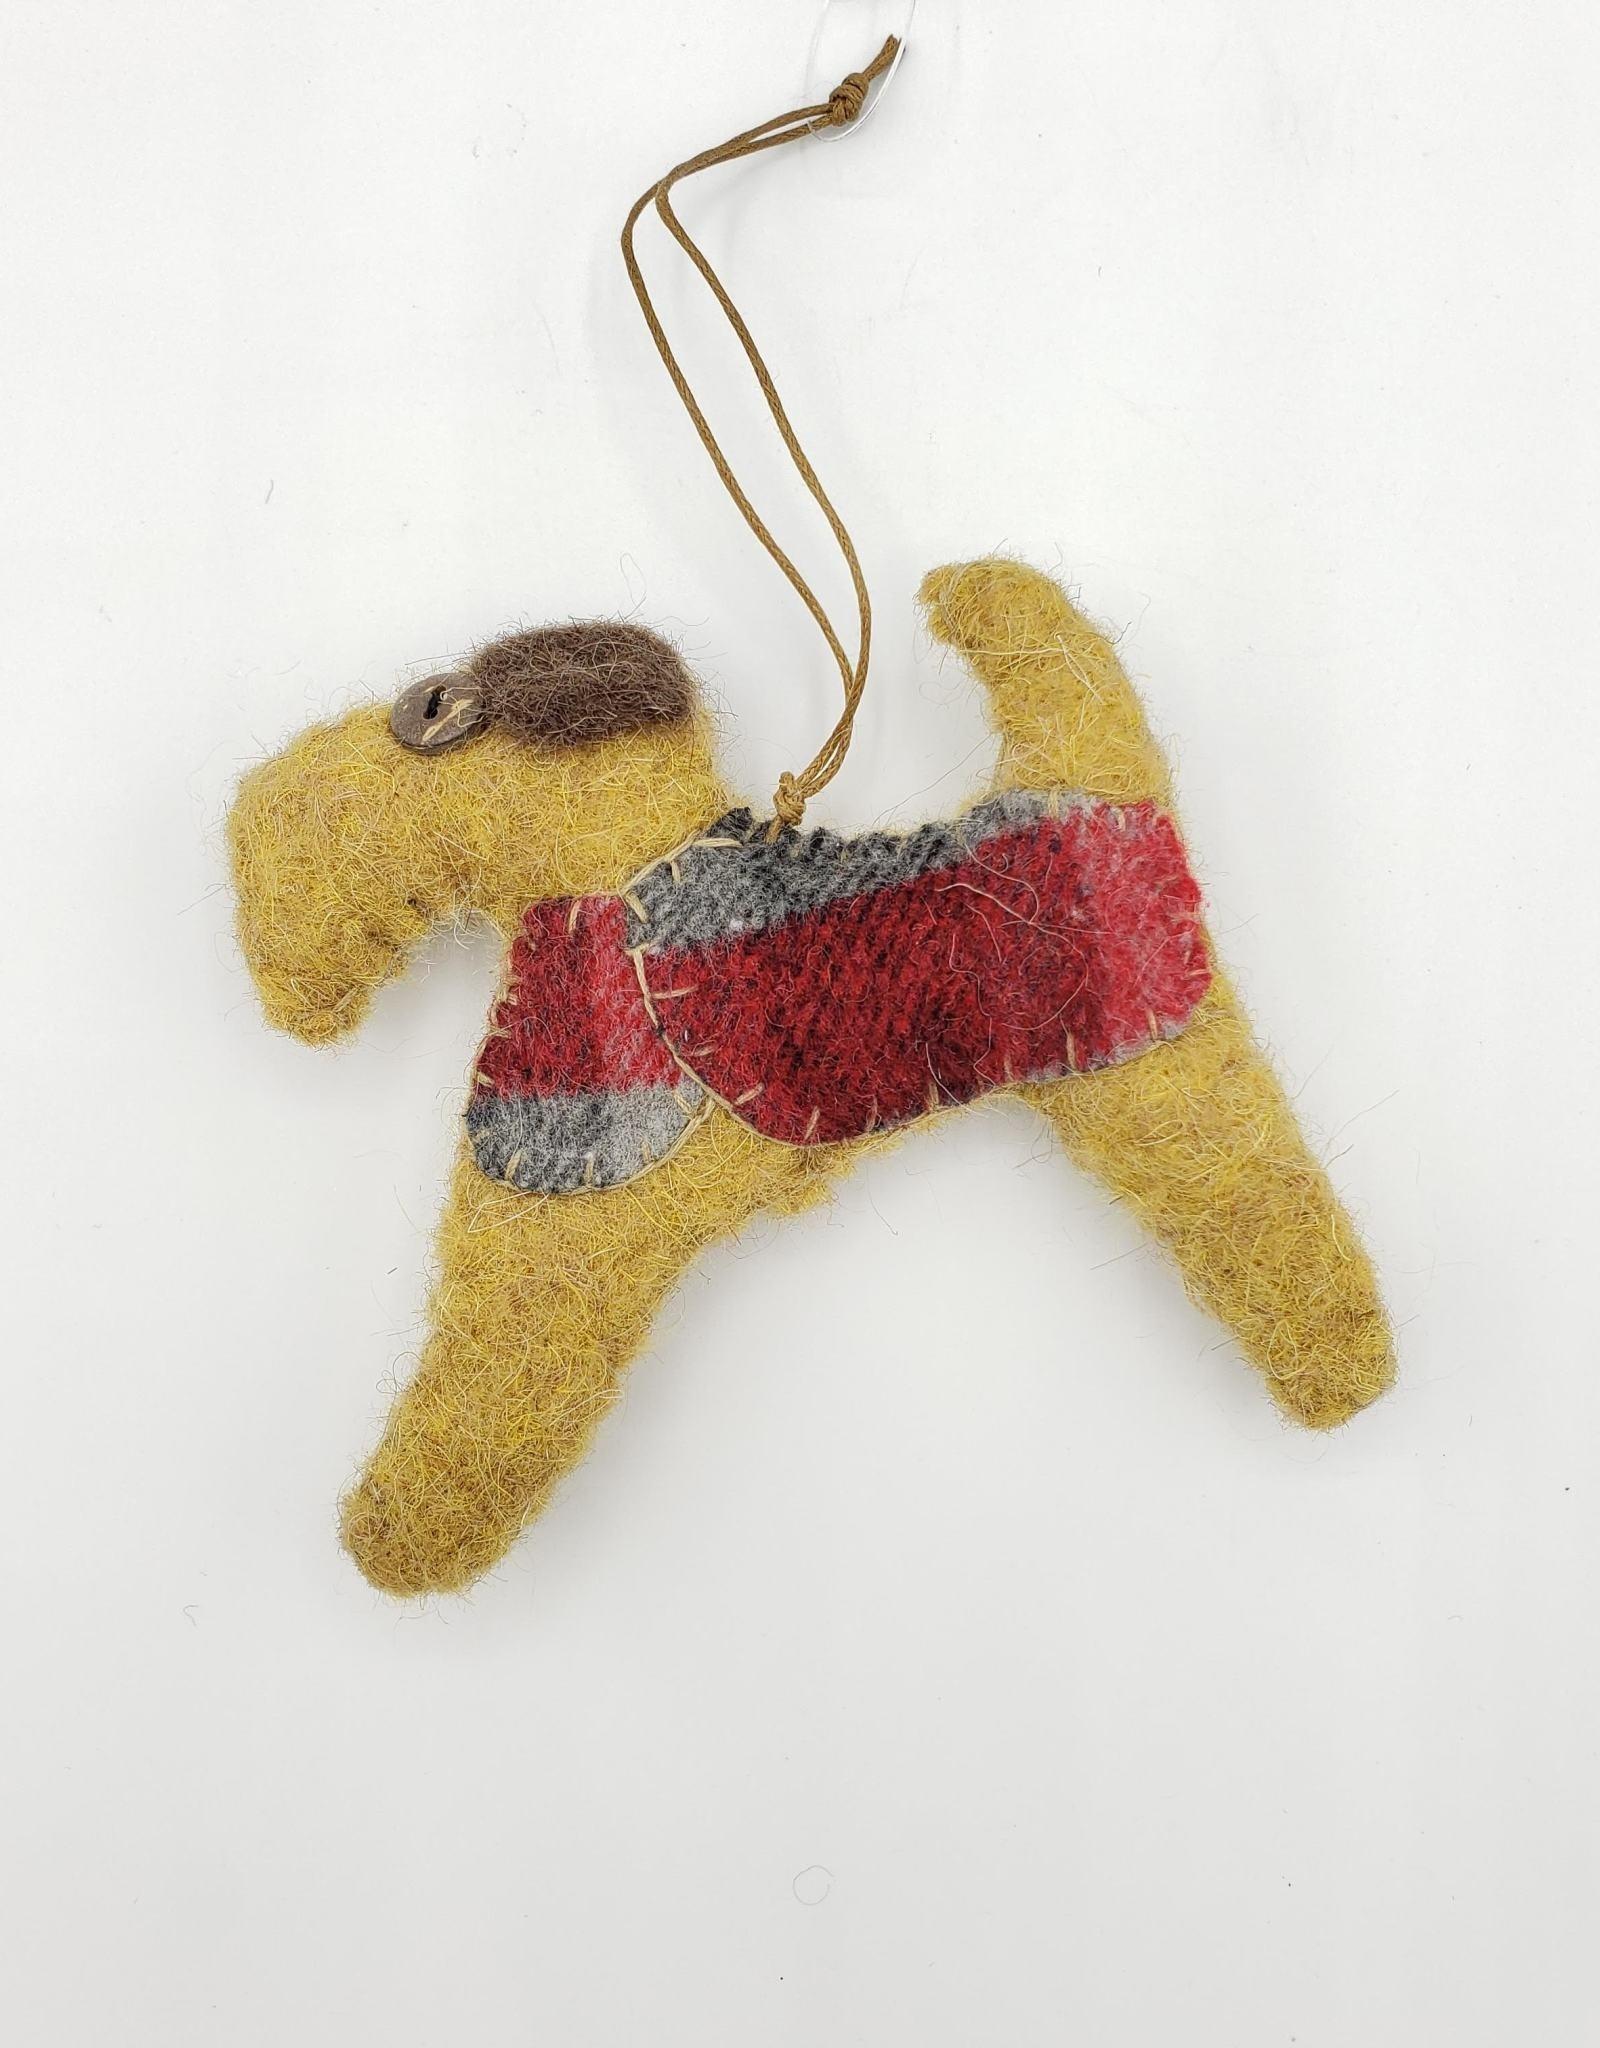 Tan Dog Ornament, Stitched Fabric & Felt